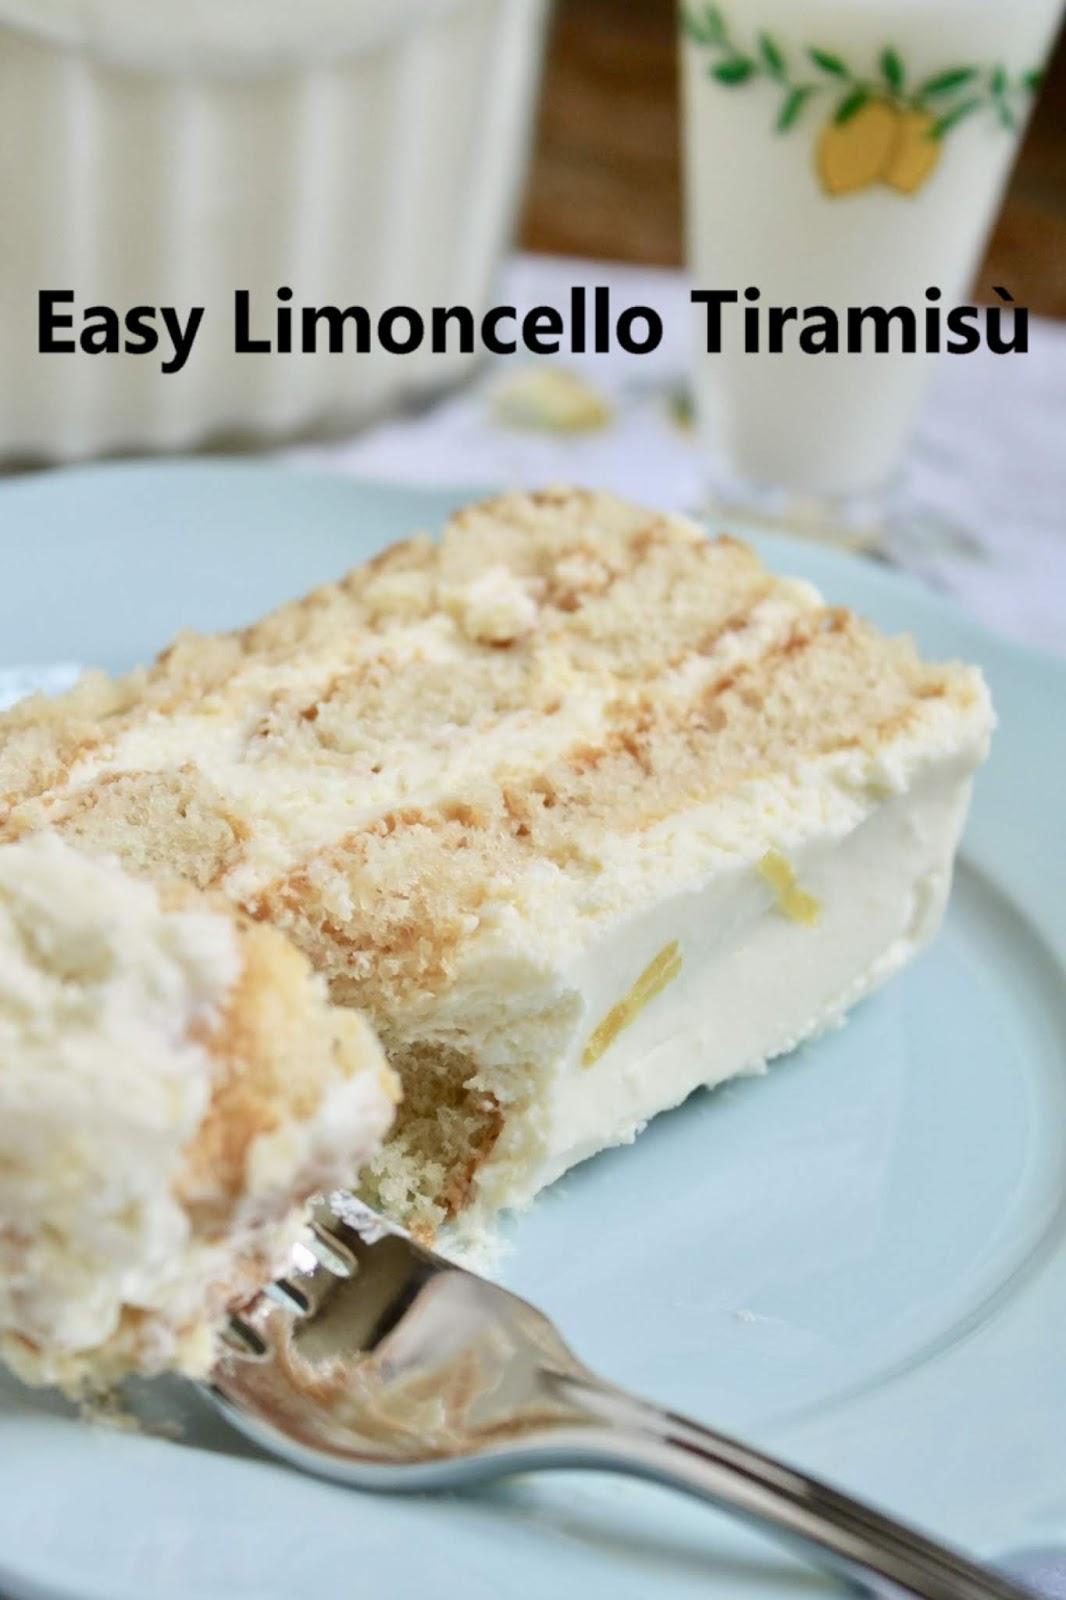 Easy Limoncello Tiramisù